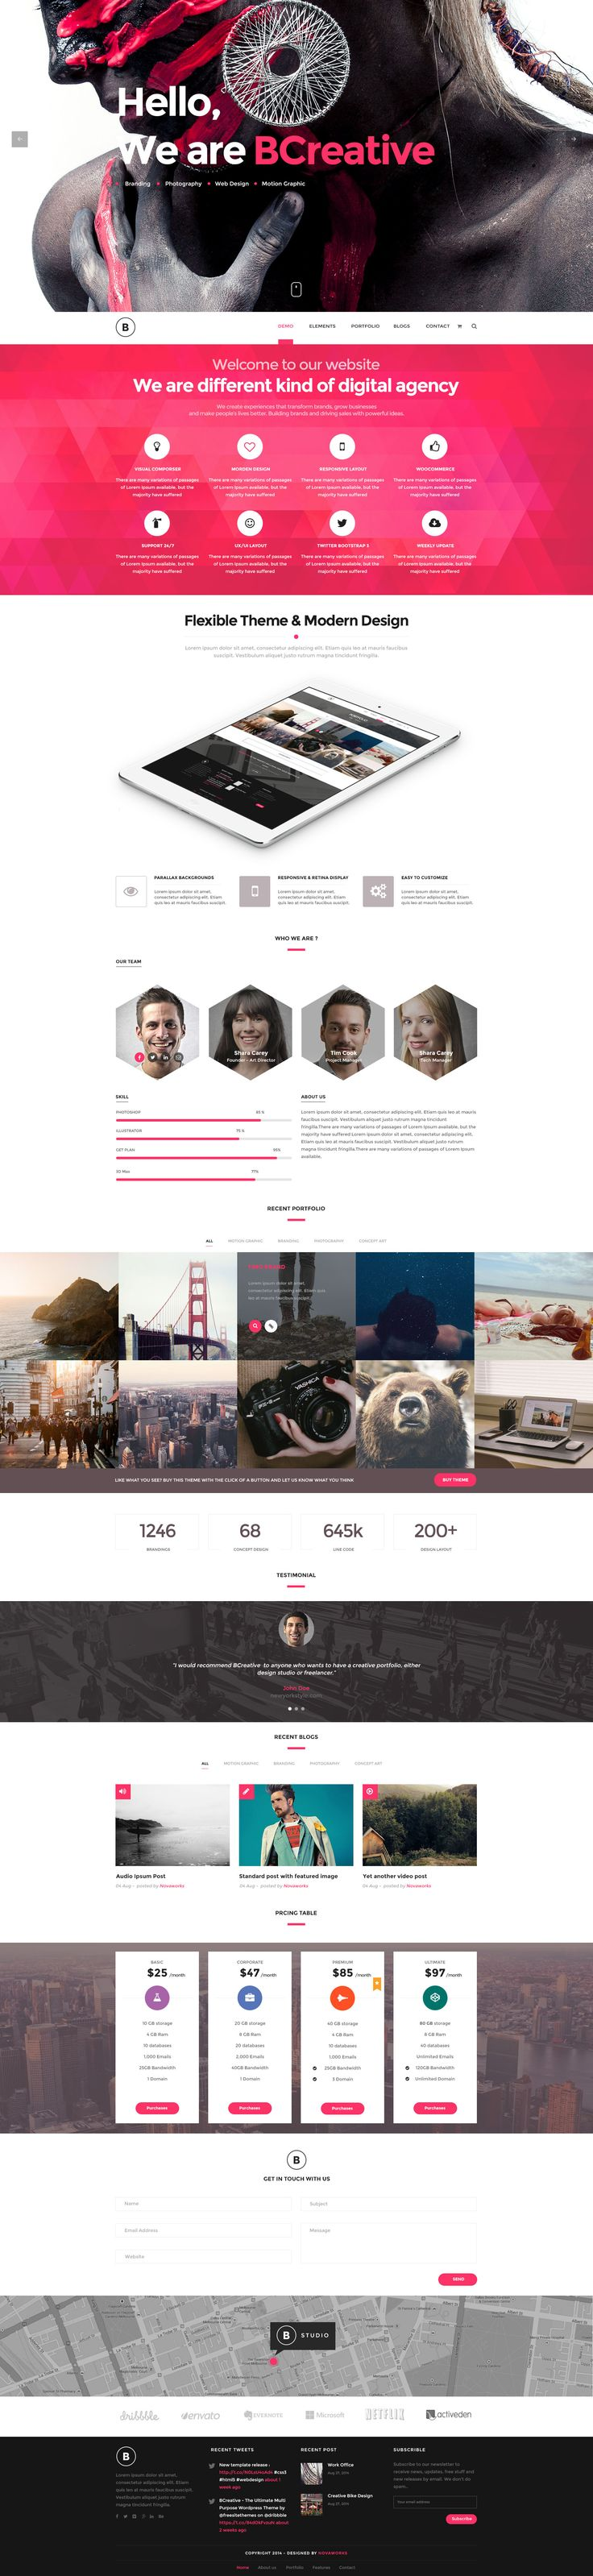 BCreative - Premium PSD Template #web #psd